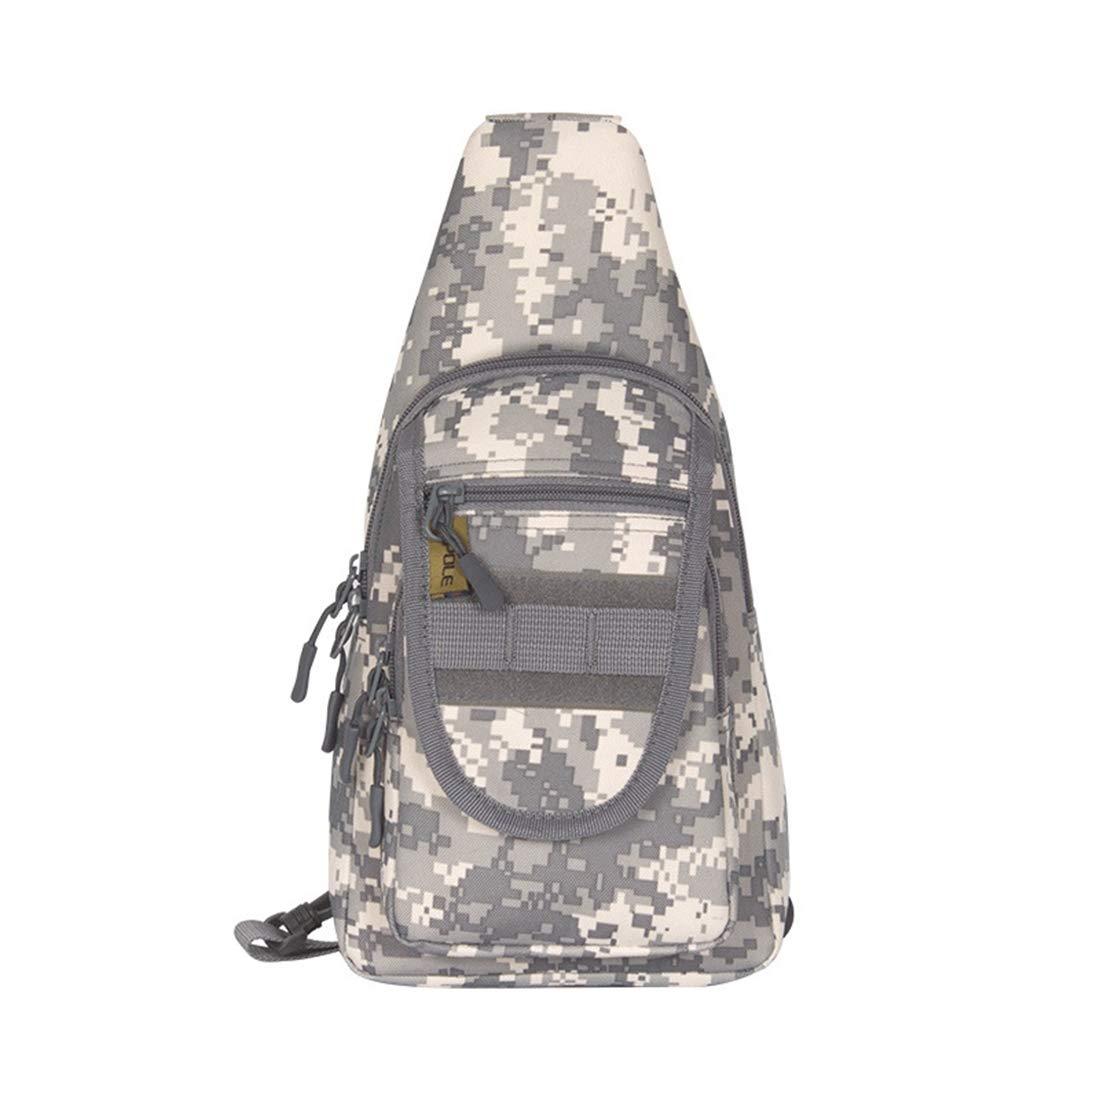 Color : Black RABILTY Outdoor Backpack Sport Daypack Shoulder Bag for Camping Hiking Trekking Rover Sling Pack Chest Pack